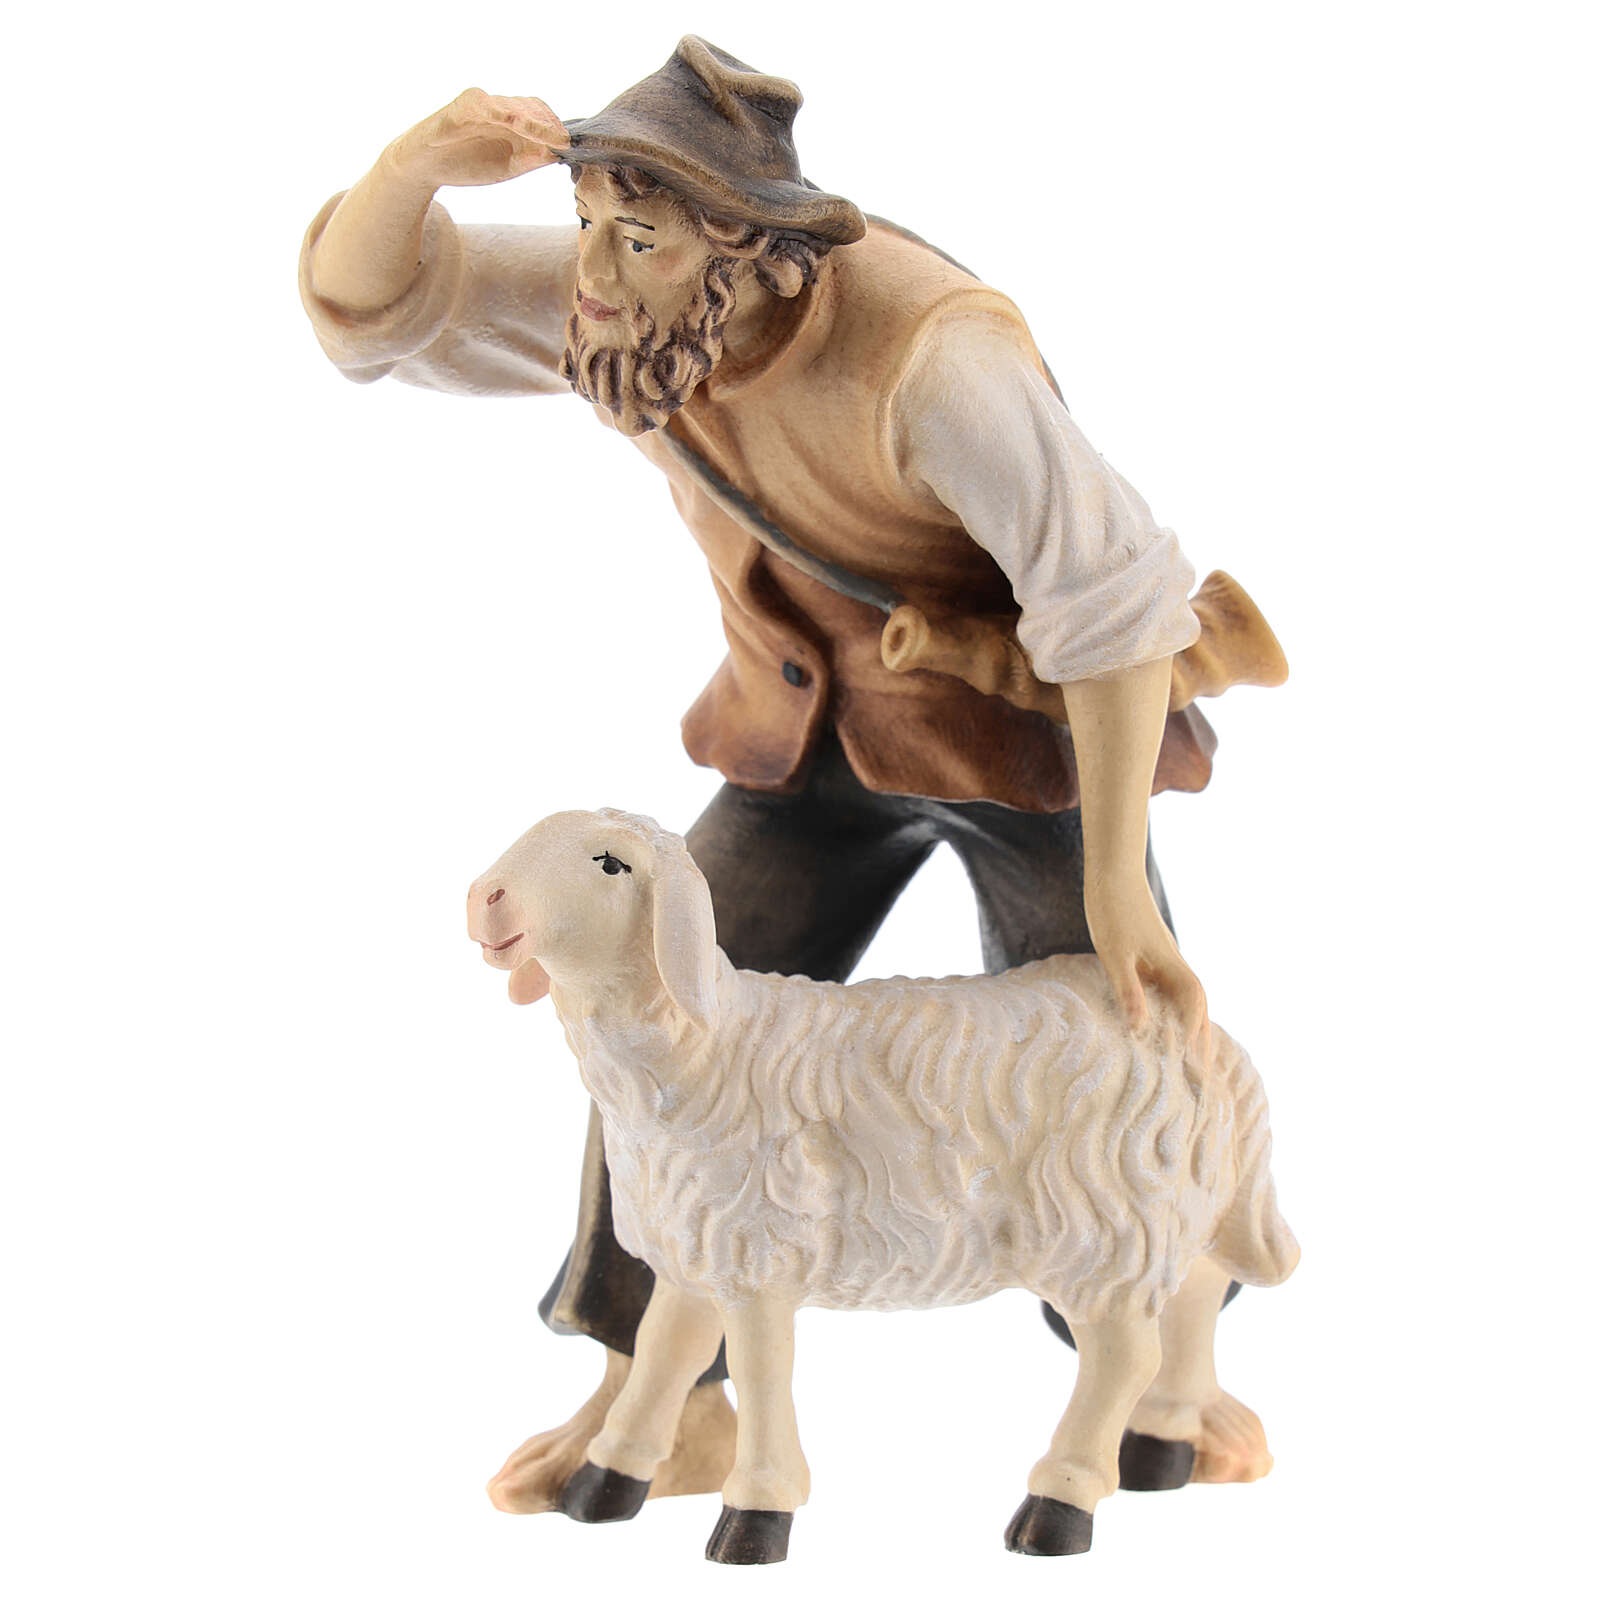 Kostner Nativity Scene 12 cm, gazing shepherd with sheep in painted wood 4